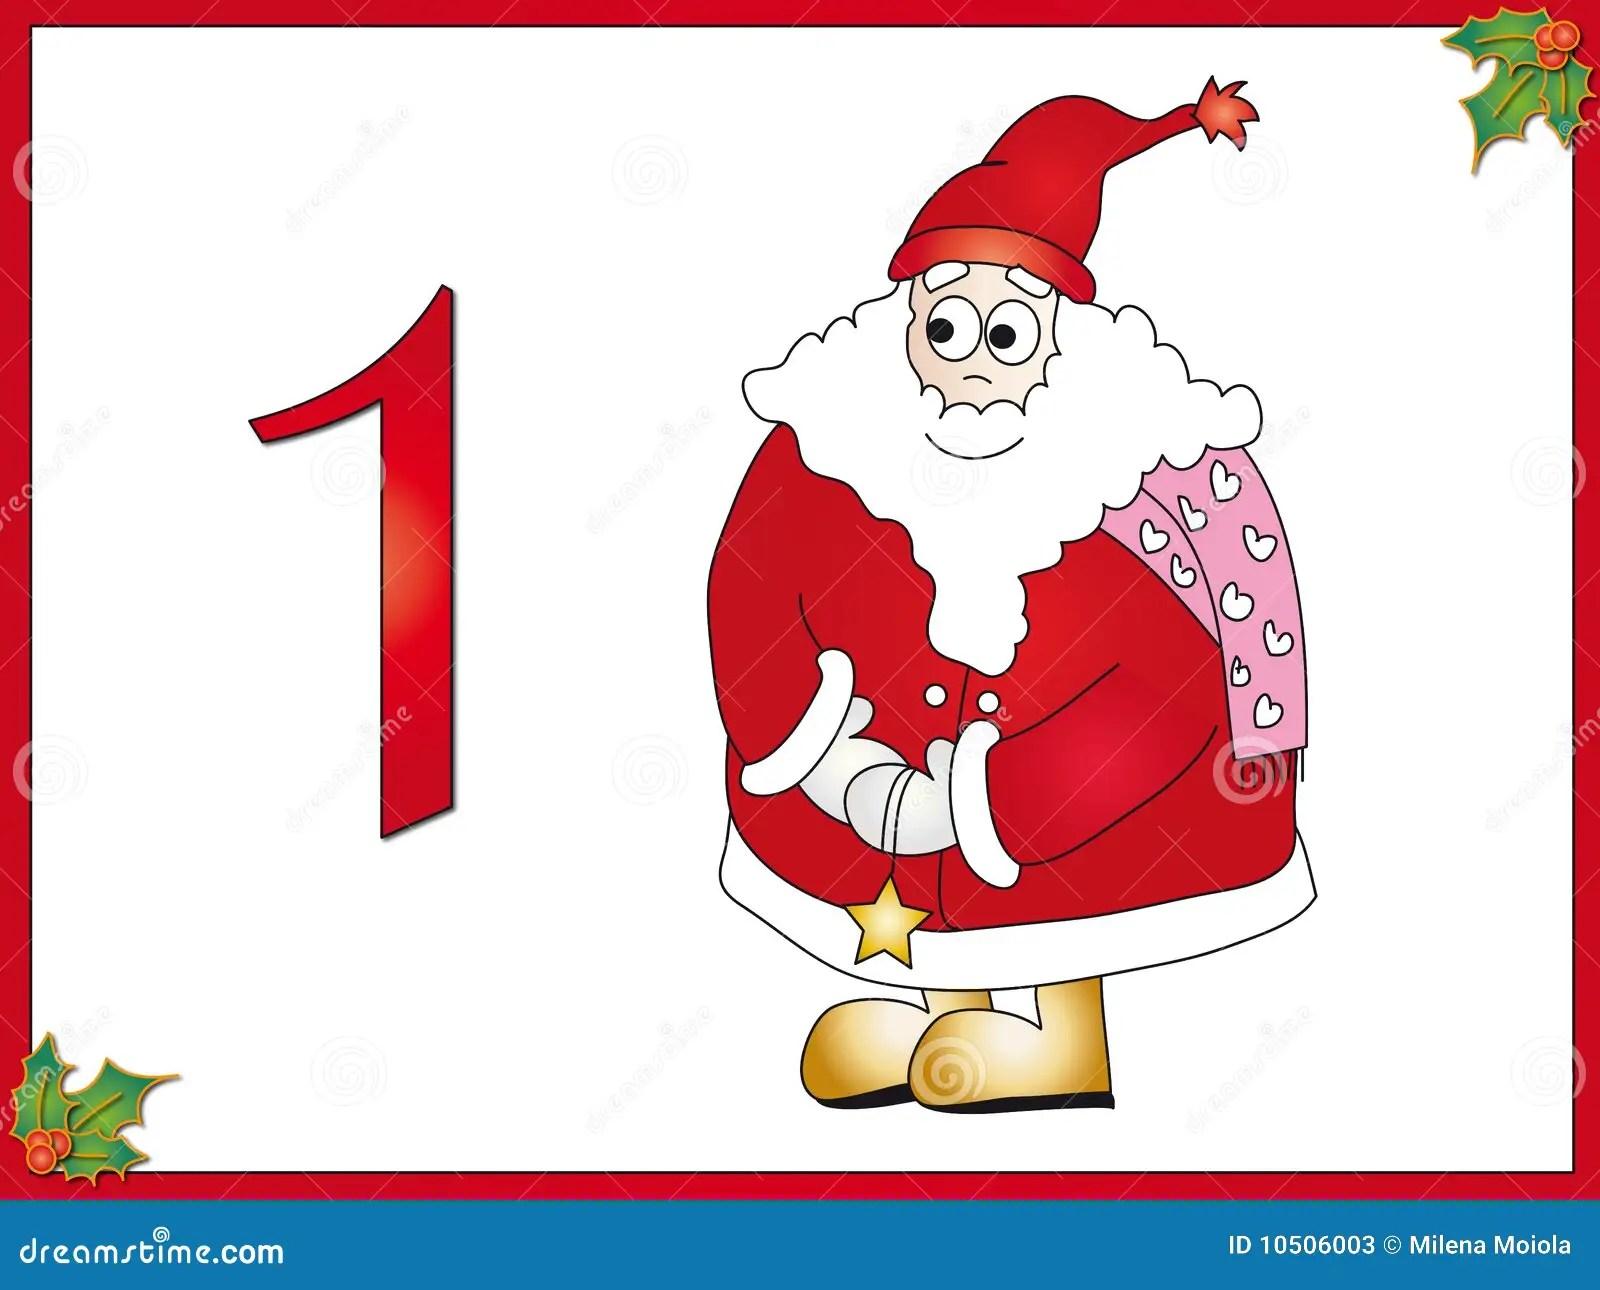 hight resolution of 12 days of christmas 1 santa claus